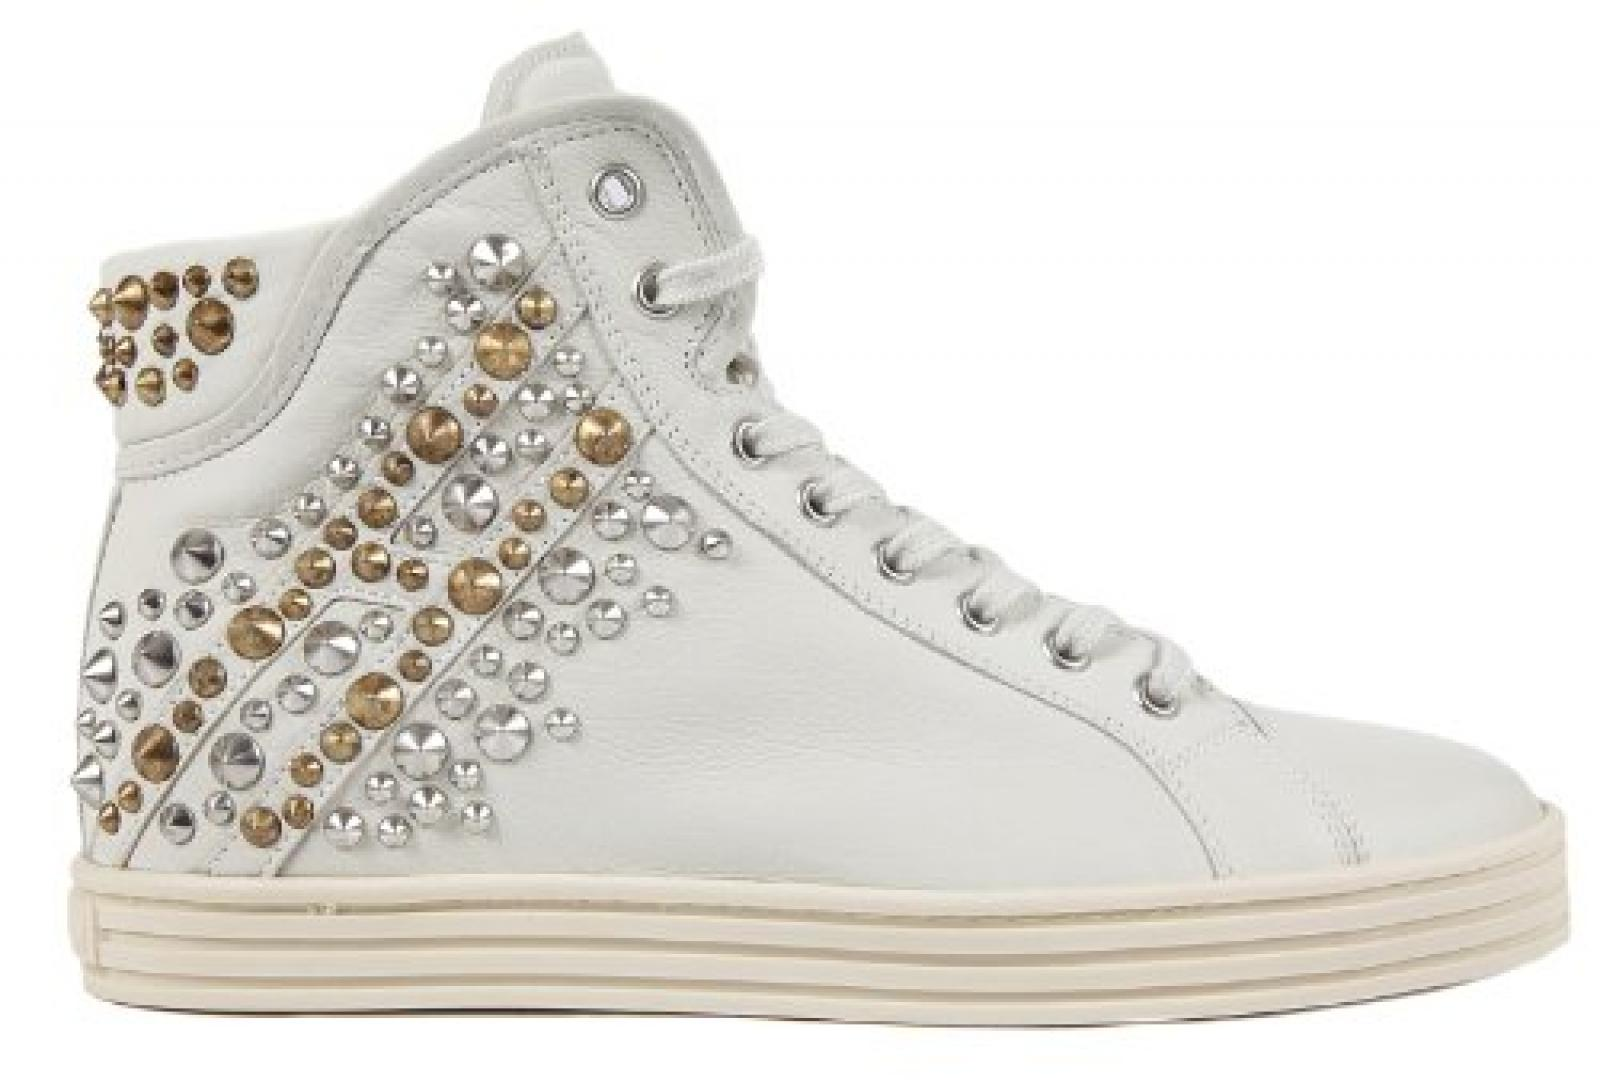 Hogan Damenschuhe Damen Leder Schuhe High Sneakers rebel Weiß